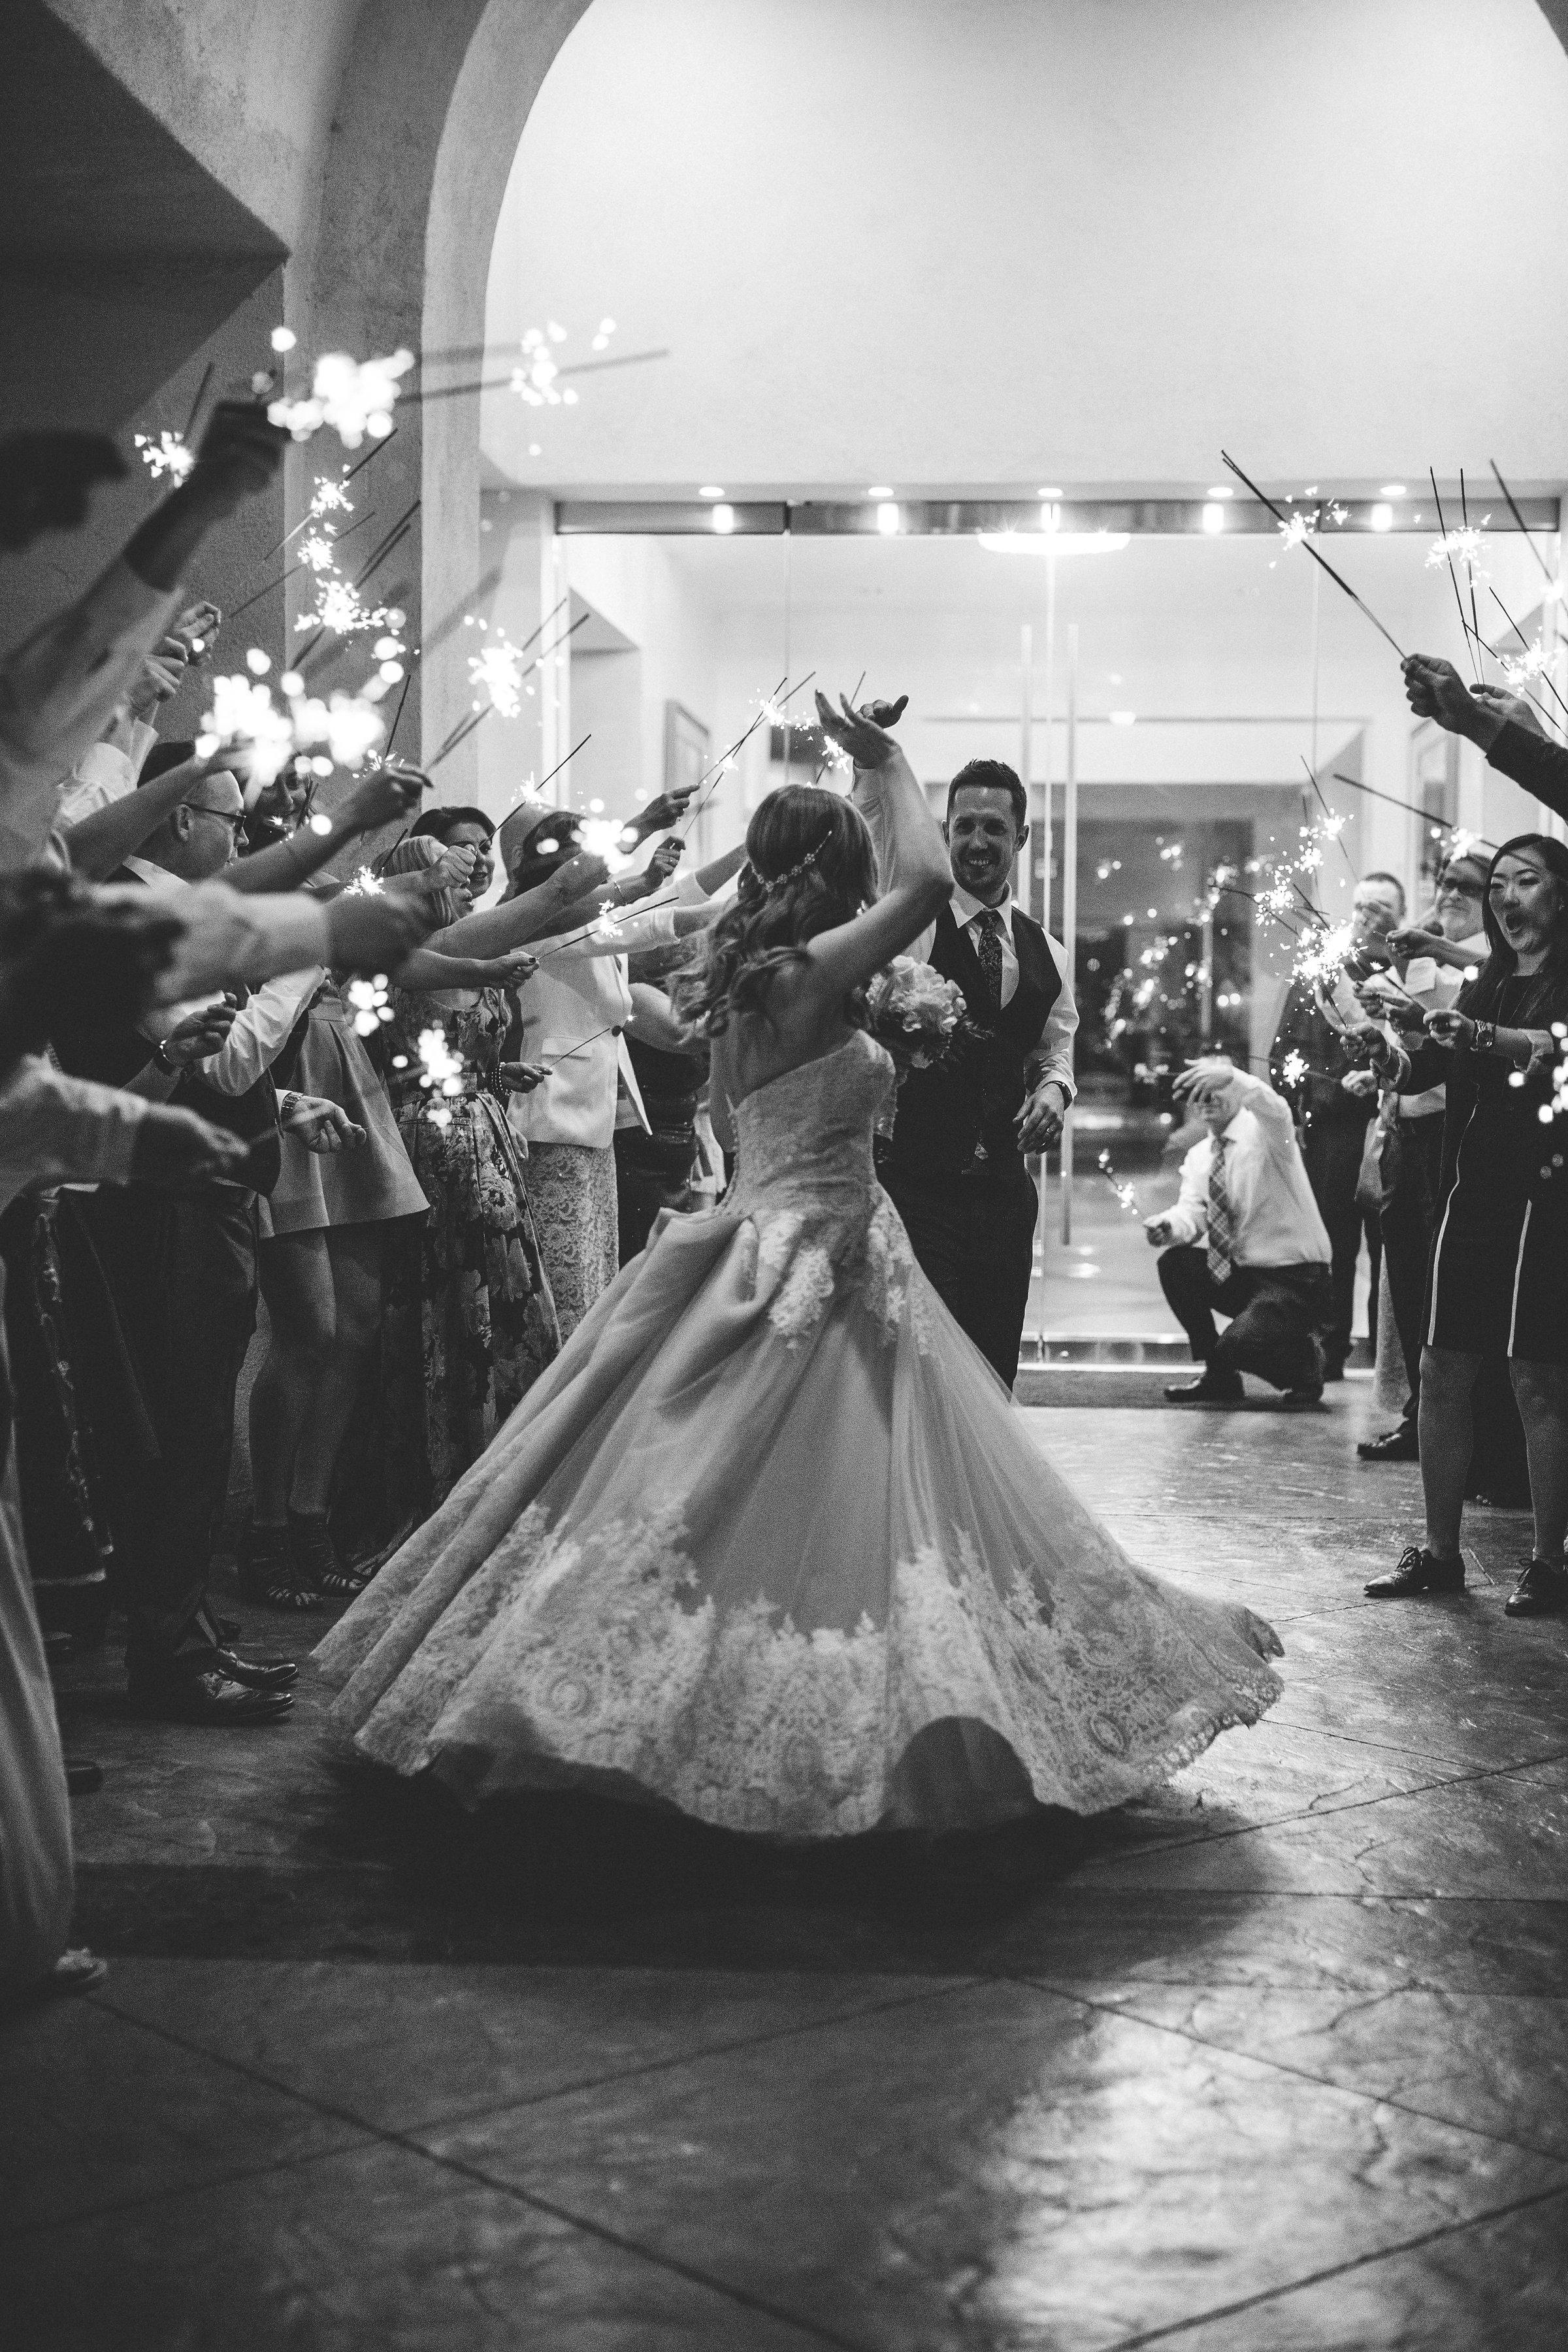 lindsey-and-ryan-intimate-winter-wedding45.jpg